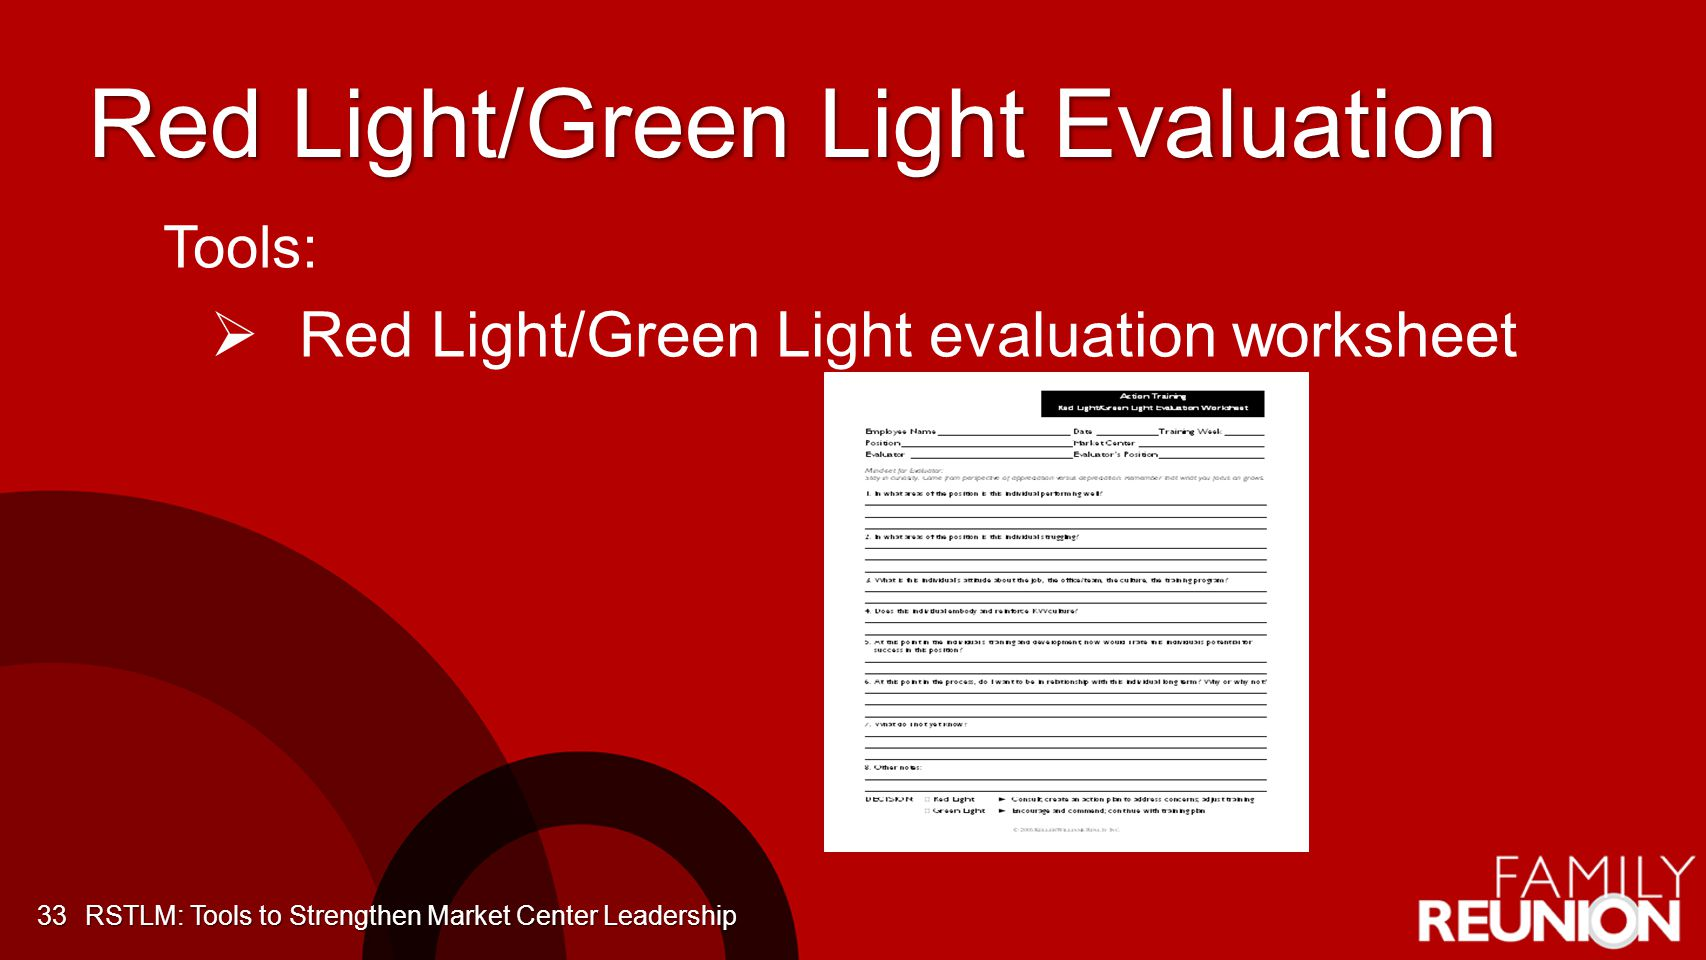 Red Light/Green Light Evaluation